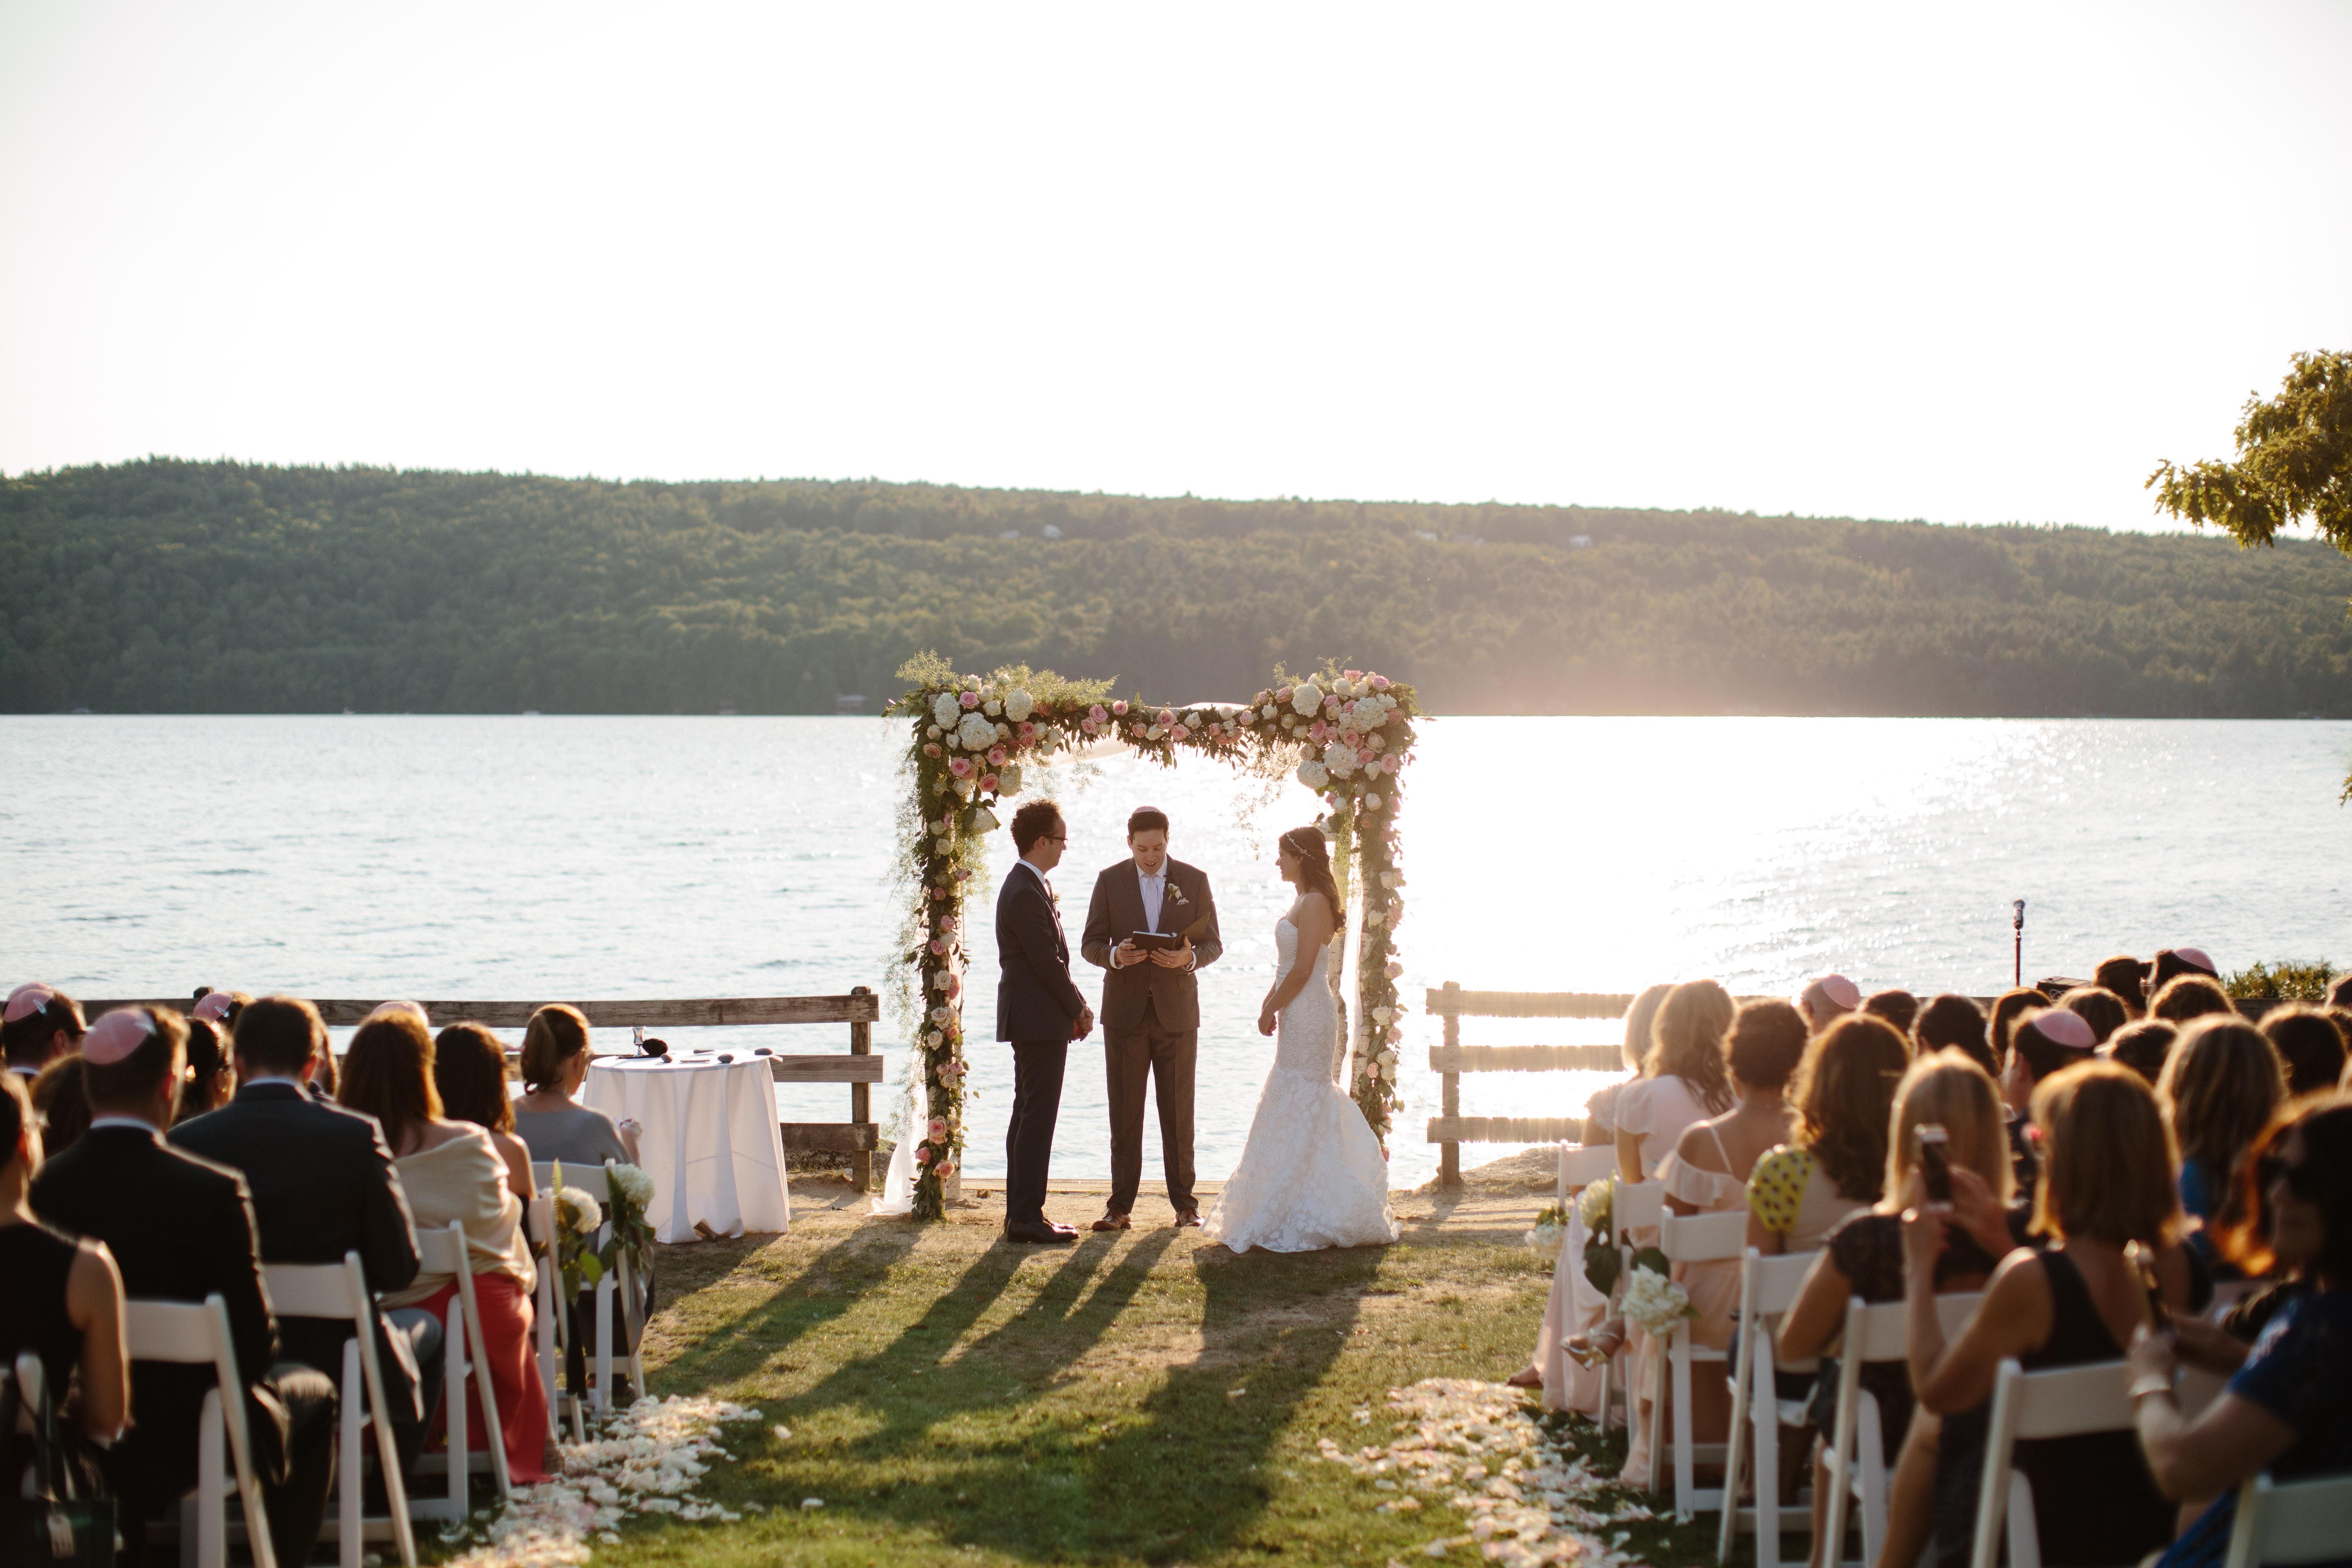 Maine Summer Camp-Wedding Venue